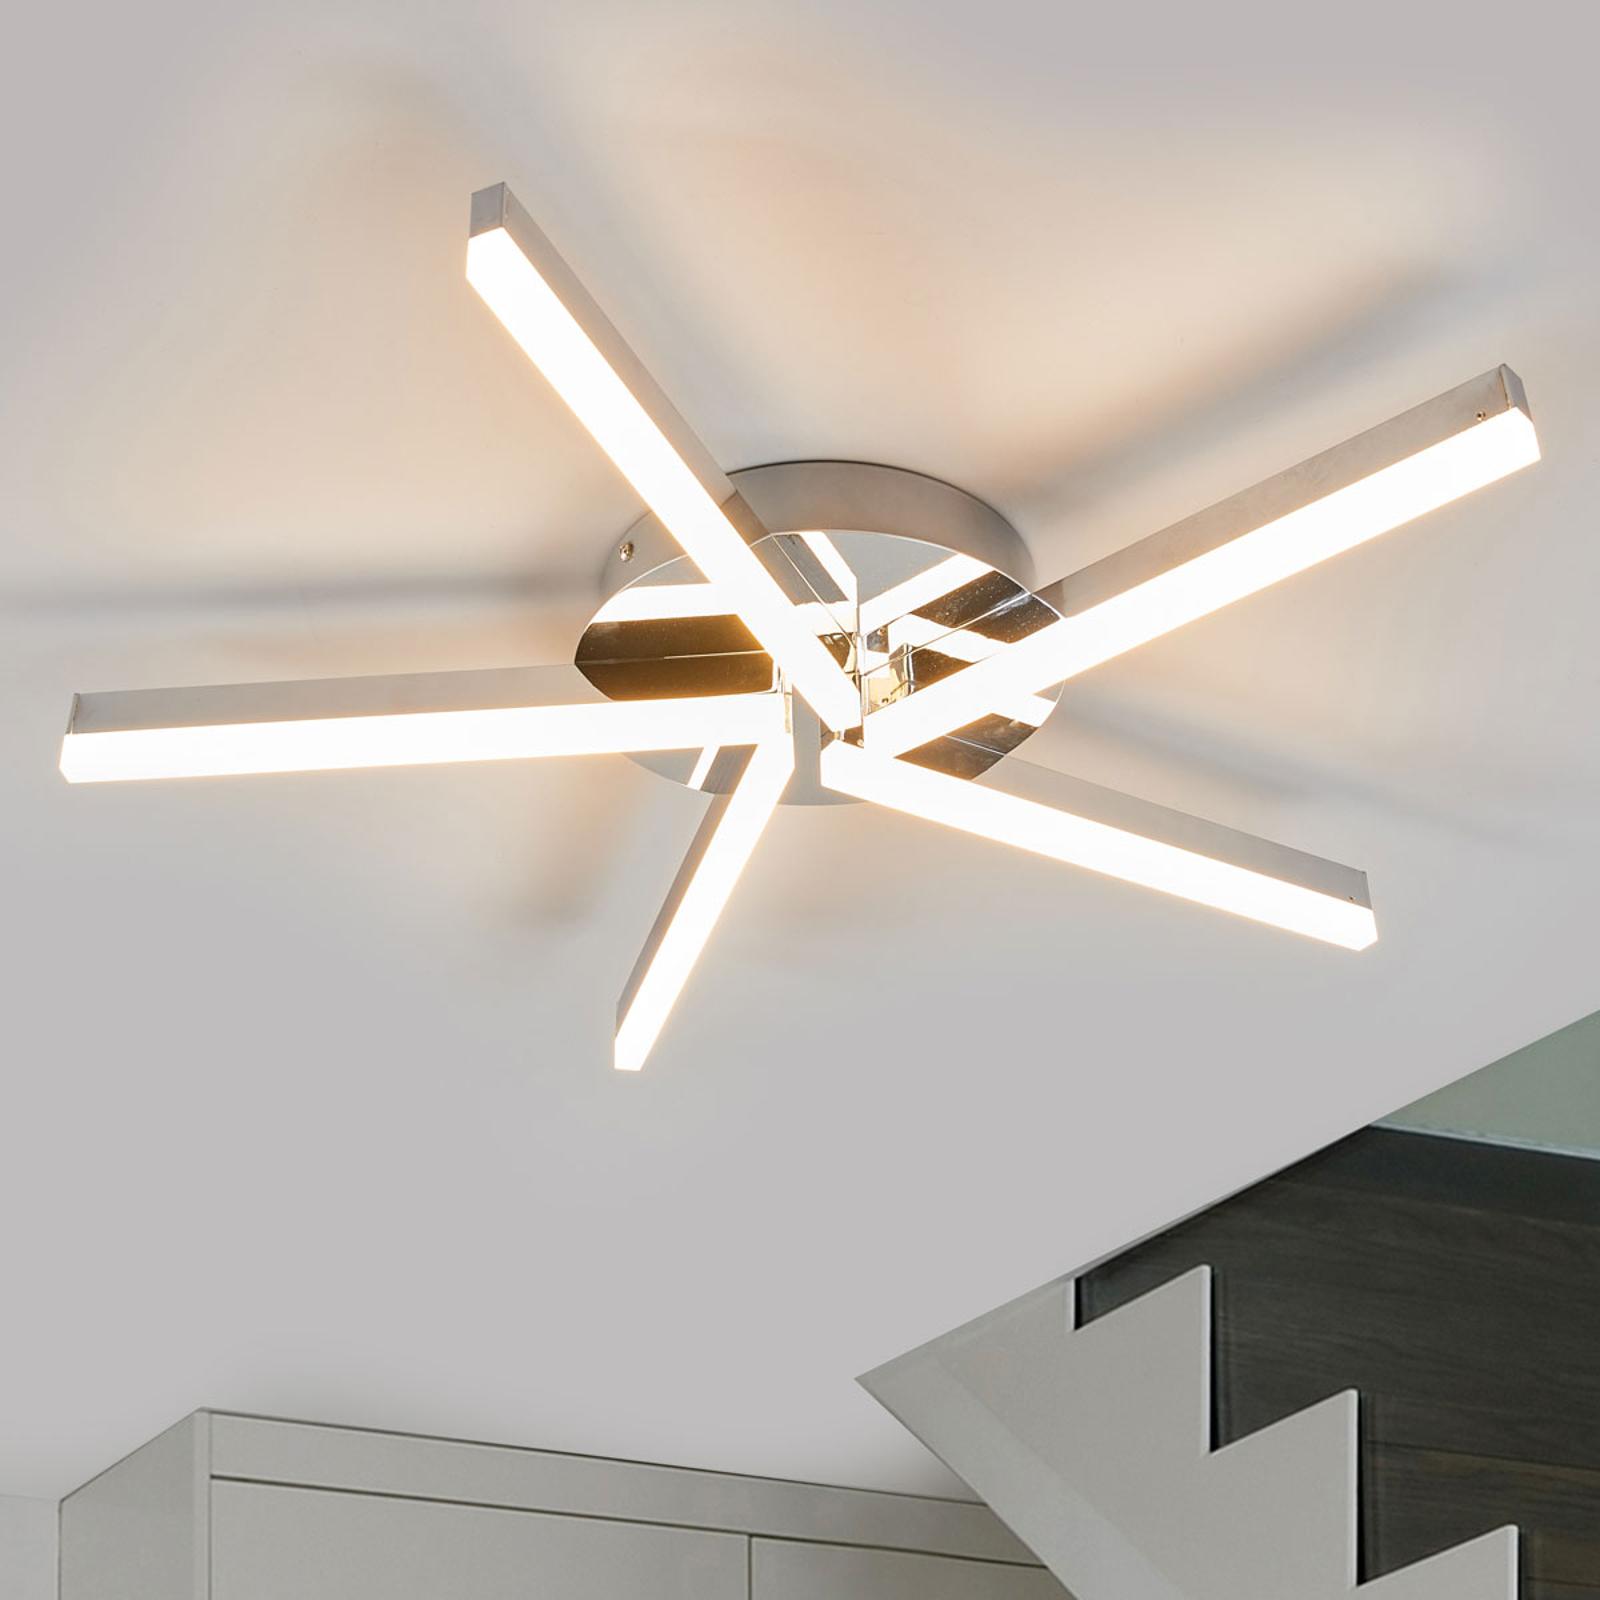 Bad LED Deckenleuchte Patrik, chrom 20 flammig IP20